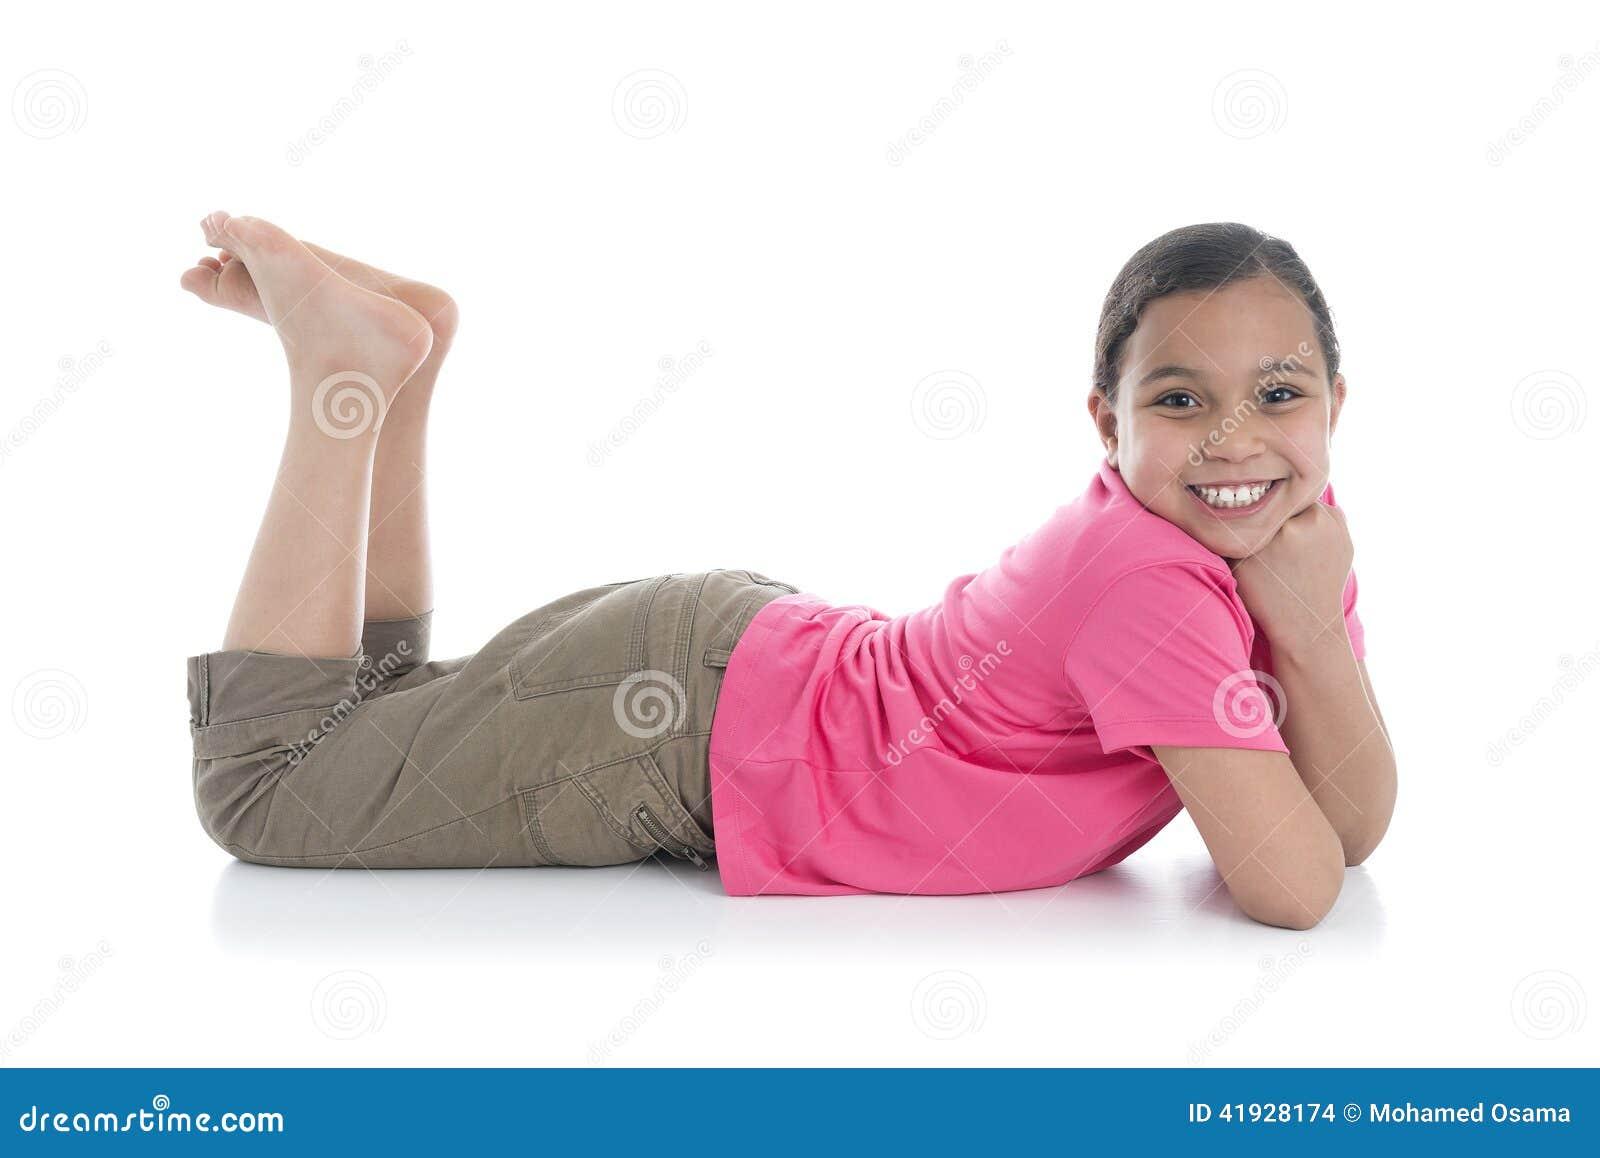 girls sexting nude pics milf